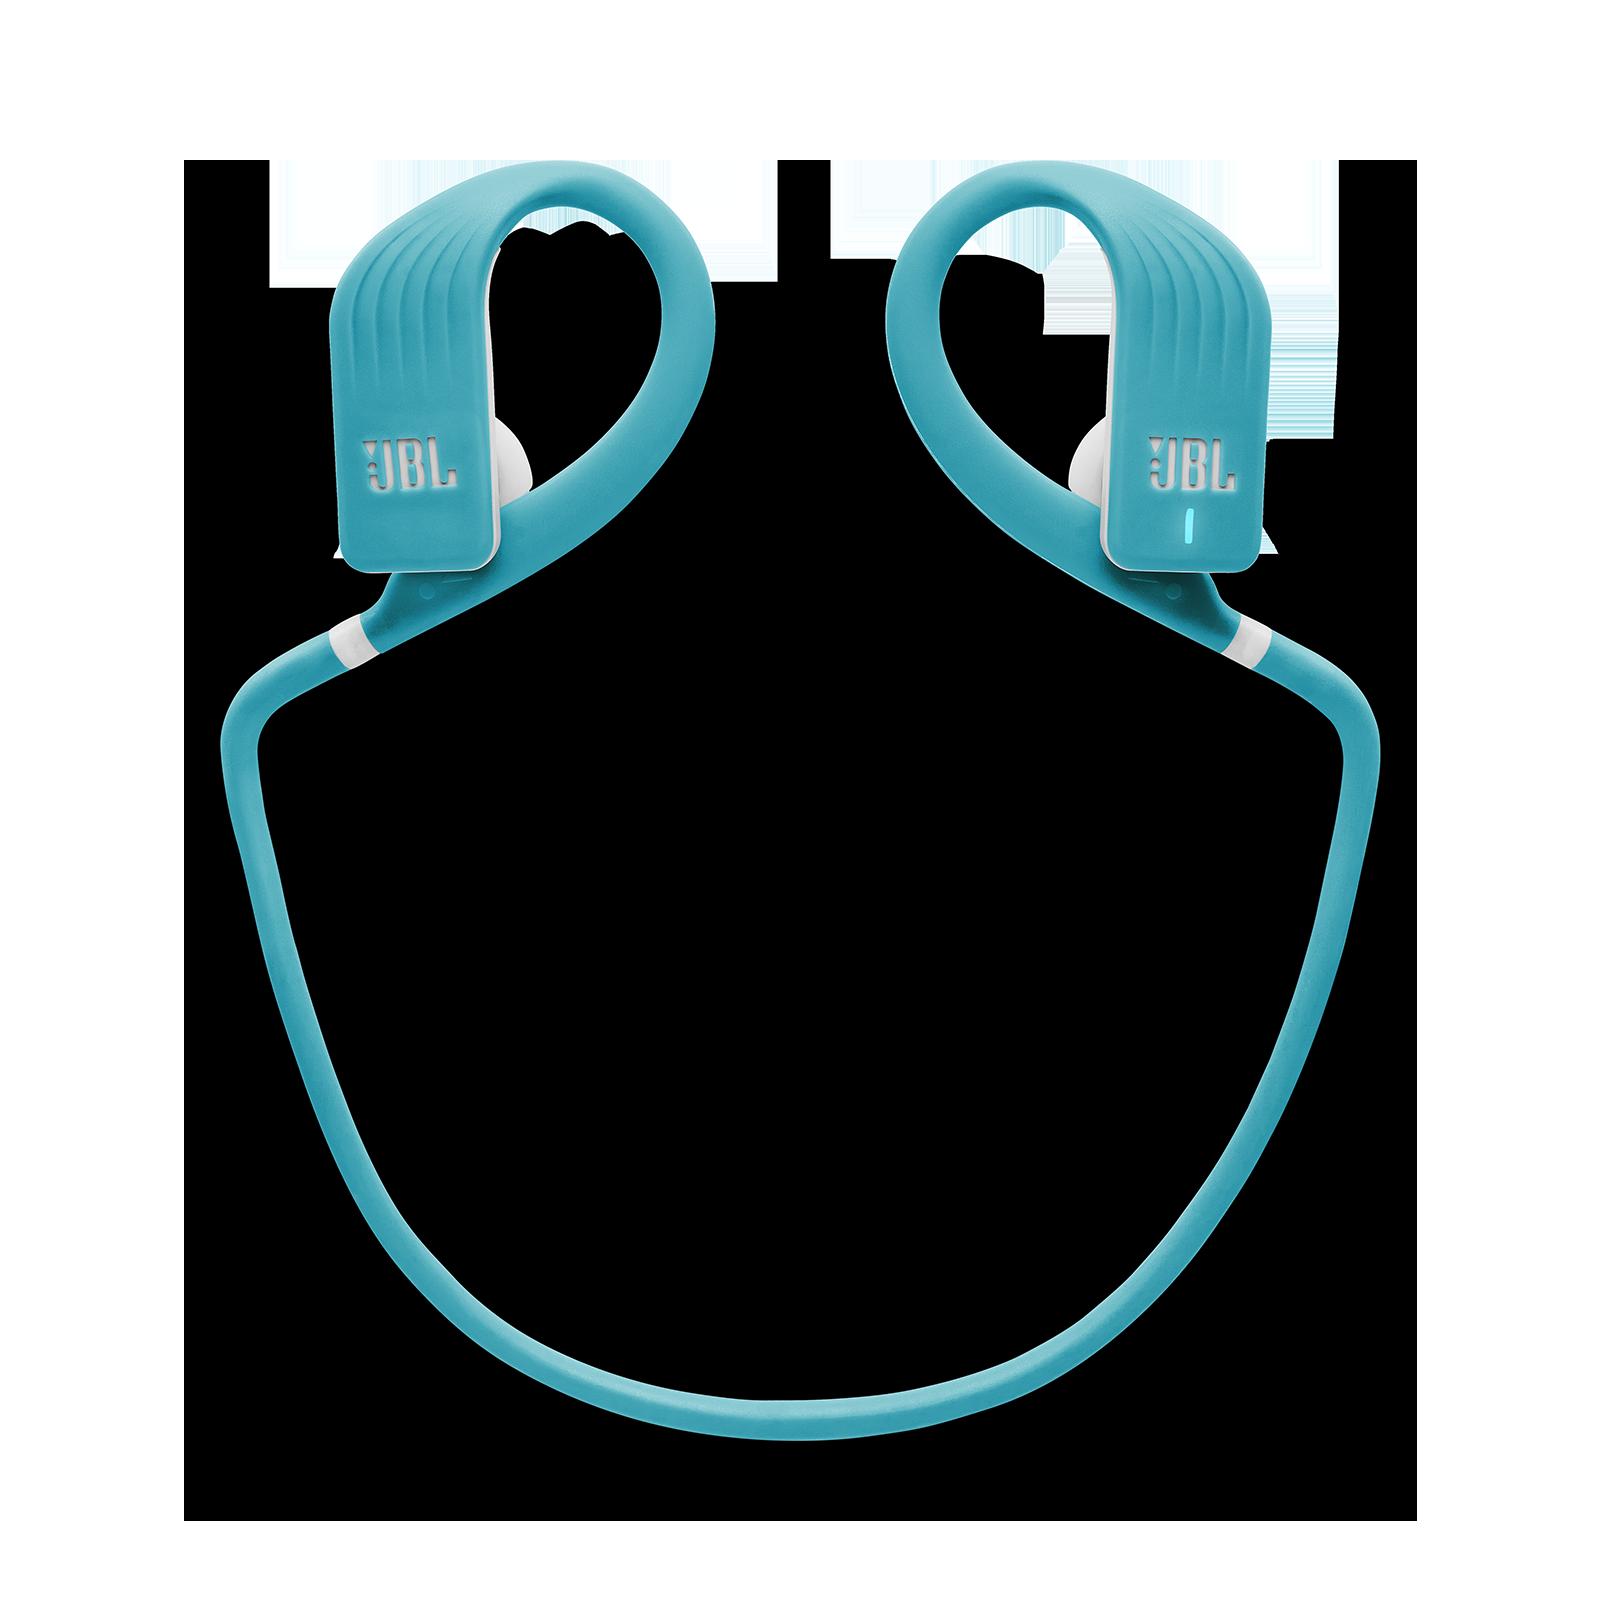 JBL Endurance JUMP - Teal - Waterproof Wireless Sport In-Ear Headphones - Detailshot 2